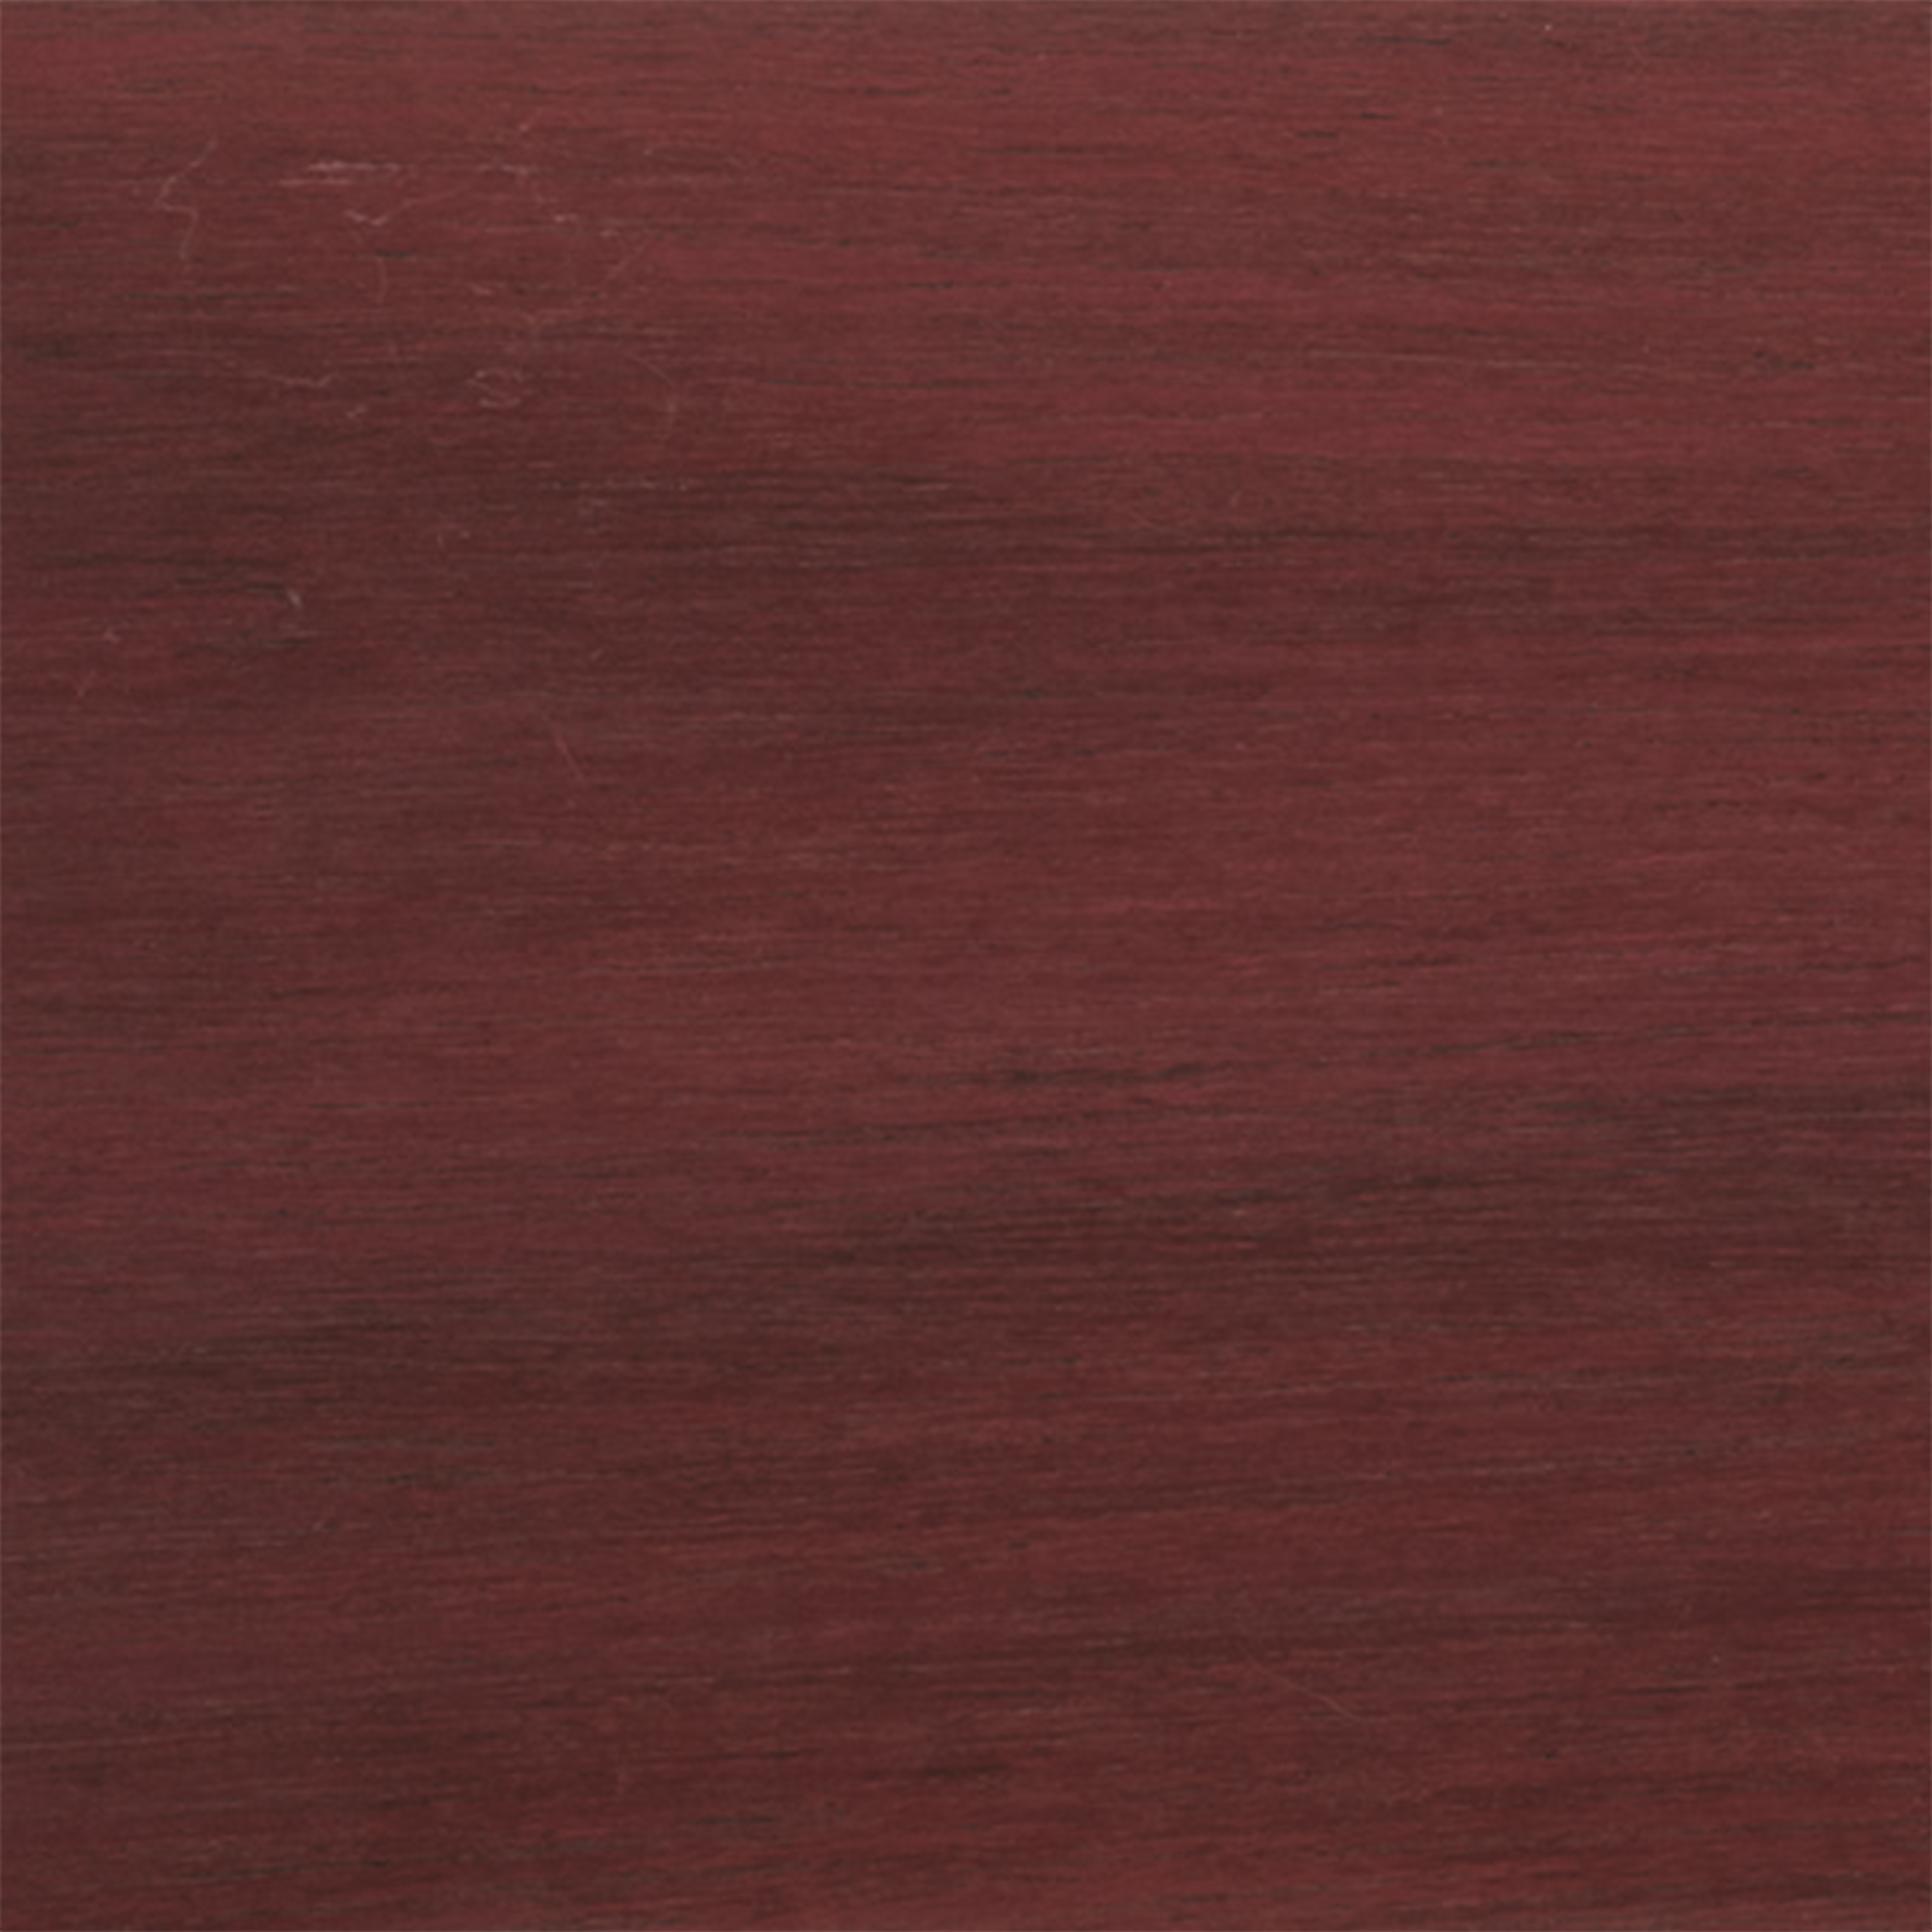 Purpleheart 1-1/2